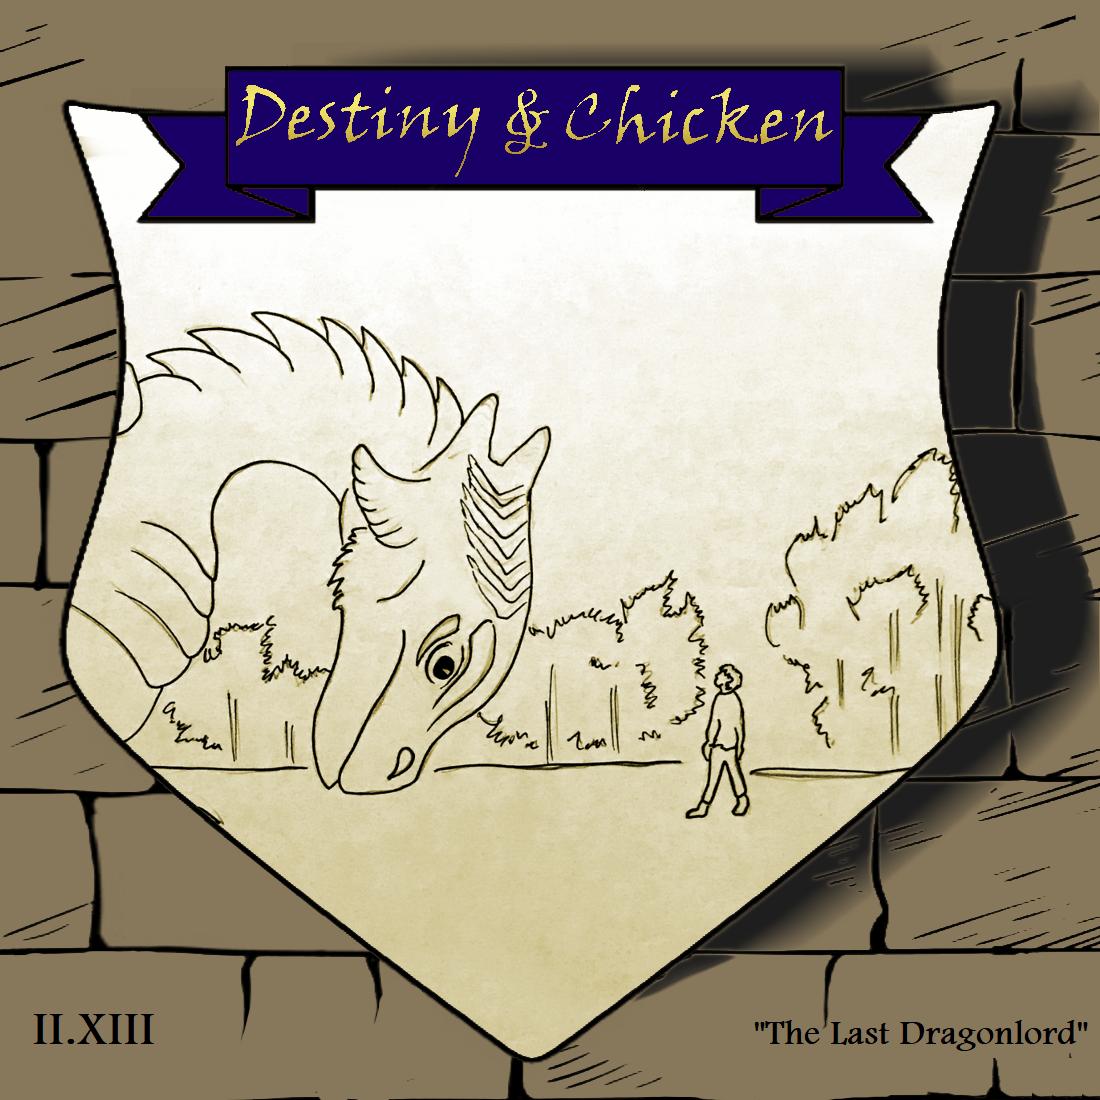 Episode II.XIII - The Last Dragonlord